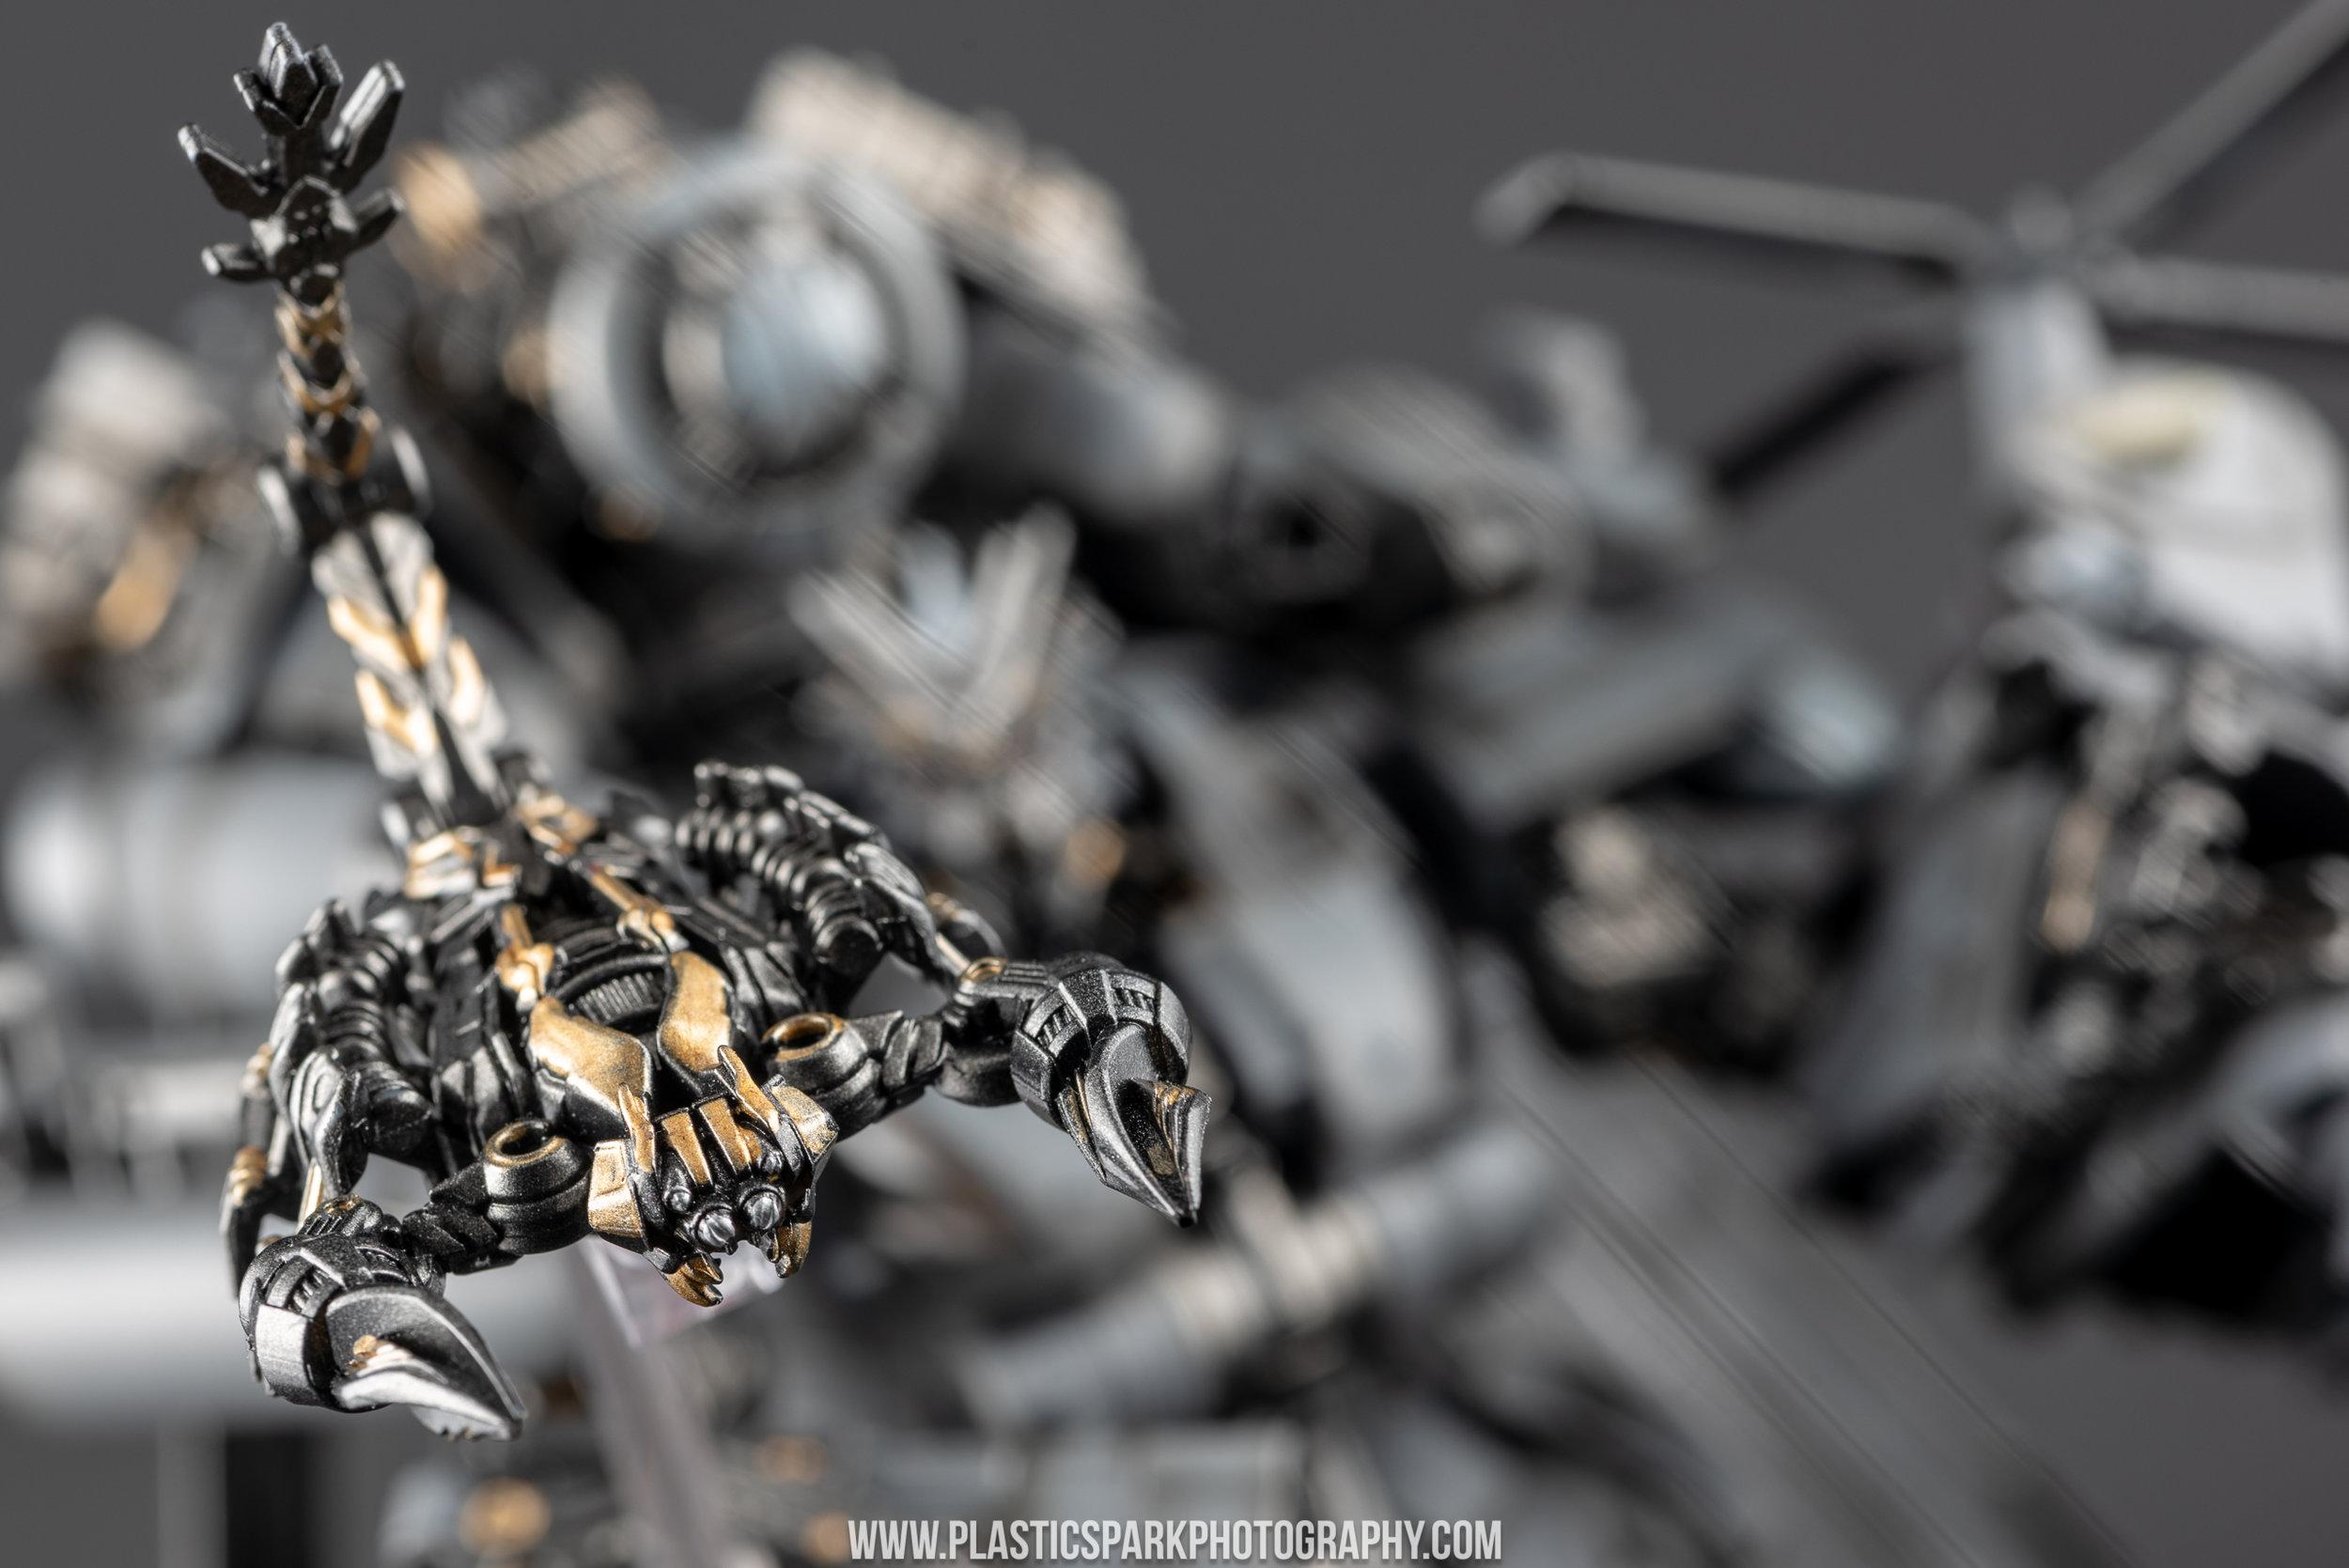 Custom Studio Series Blackout - Bryan Liu (7 of 22).jpg